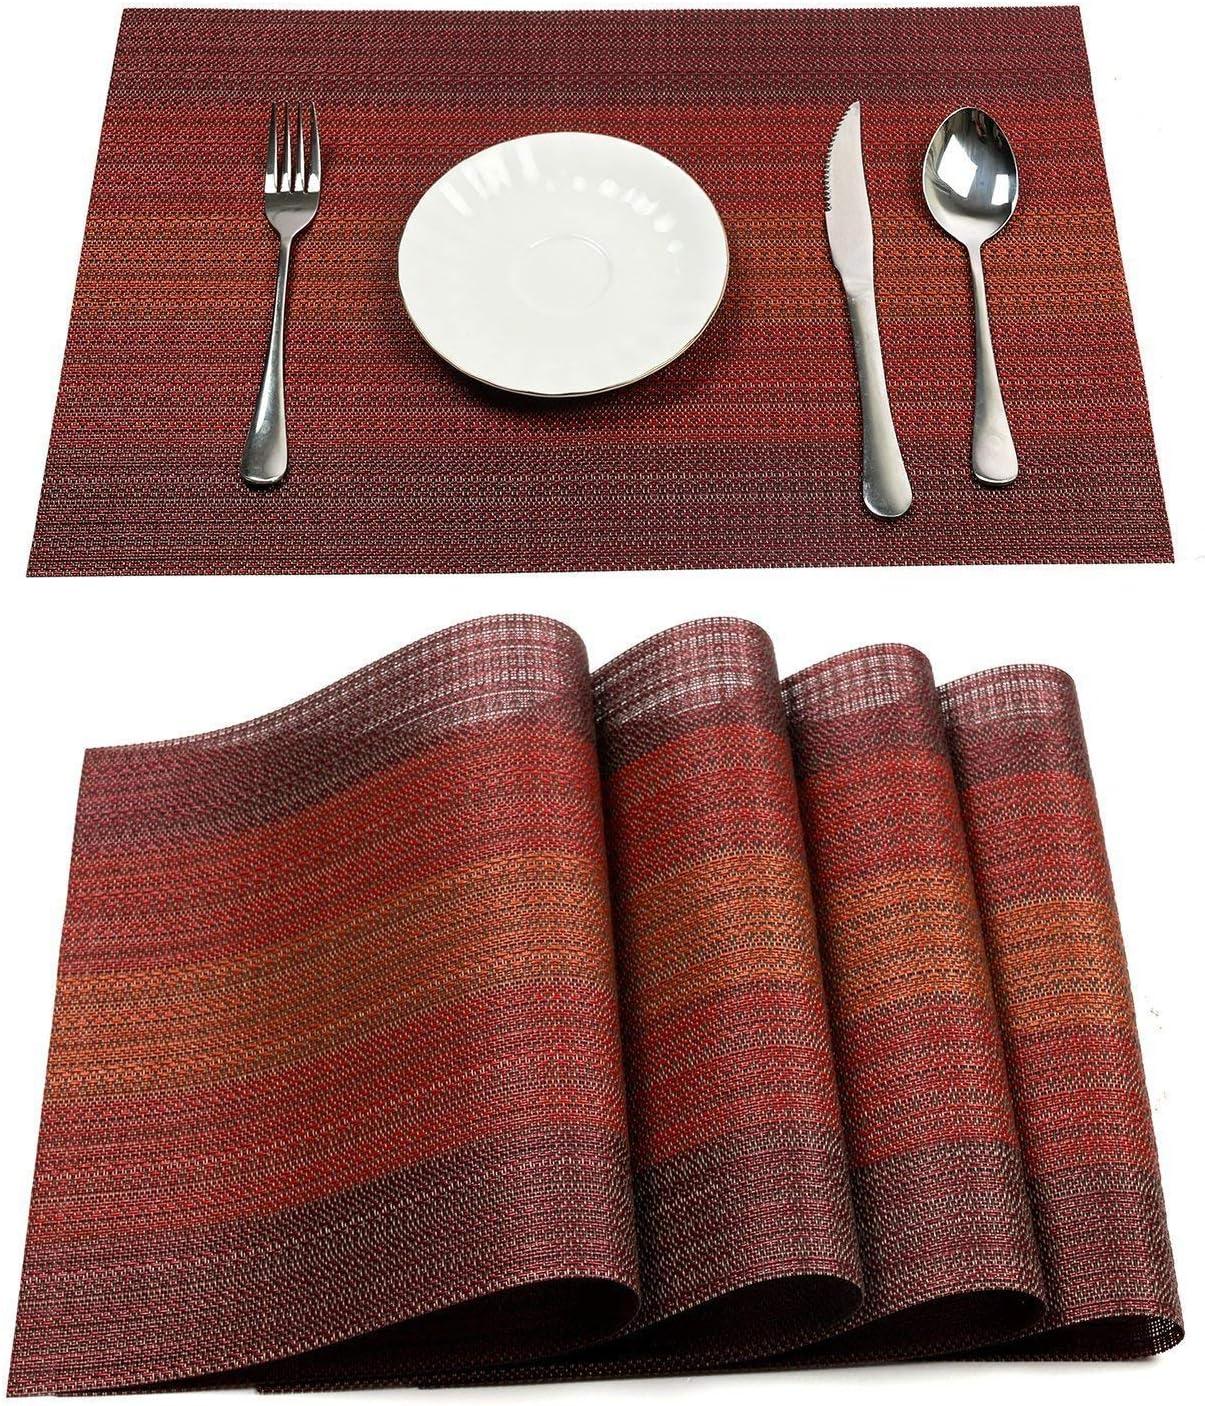 9.5 braided table mat